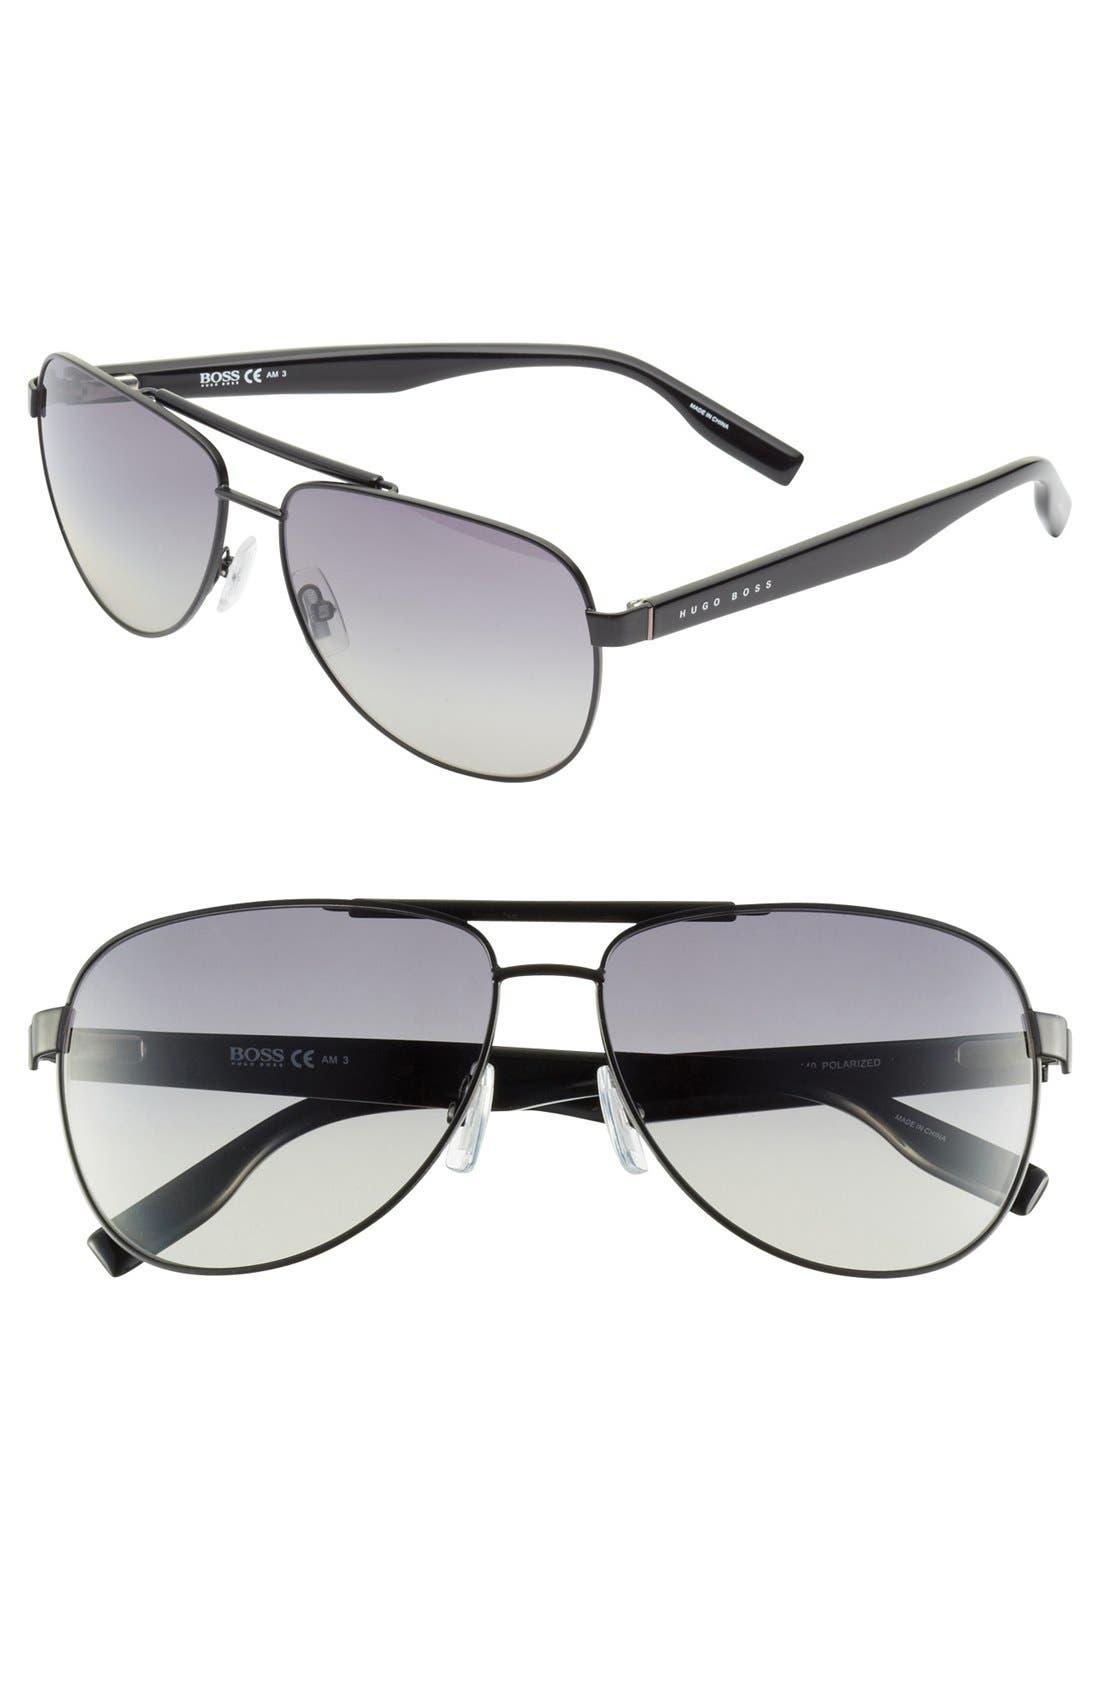 Main Image - BOSS HUGO BOSS 60mm Polarized Aviator Sunglasses